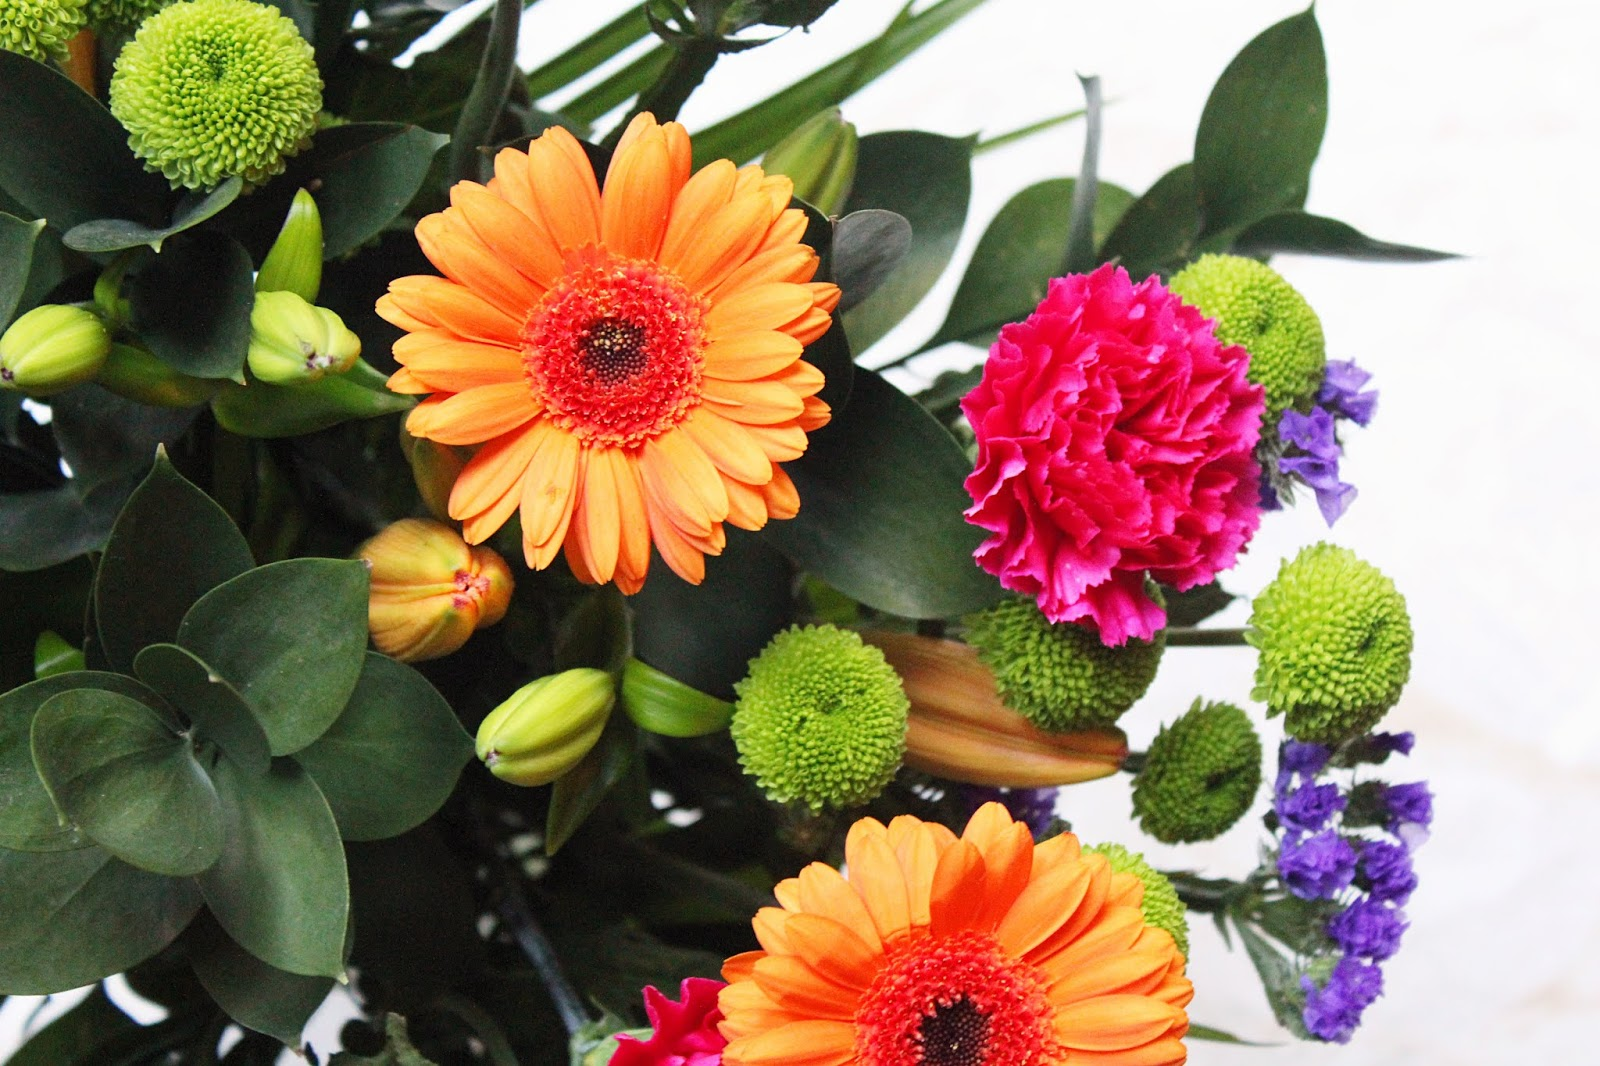 Prestige Flowers x Cancer Research